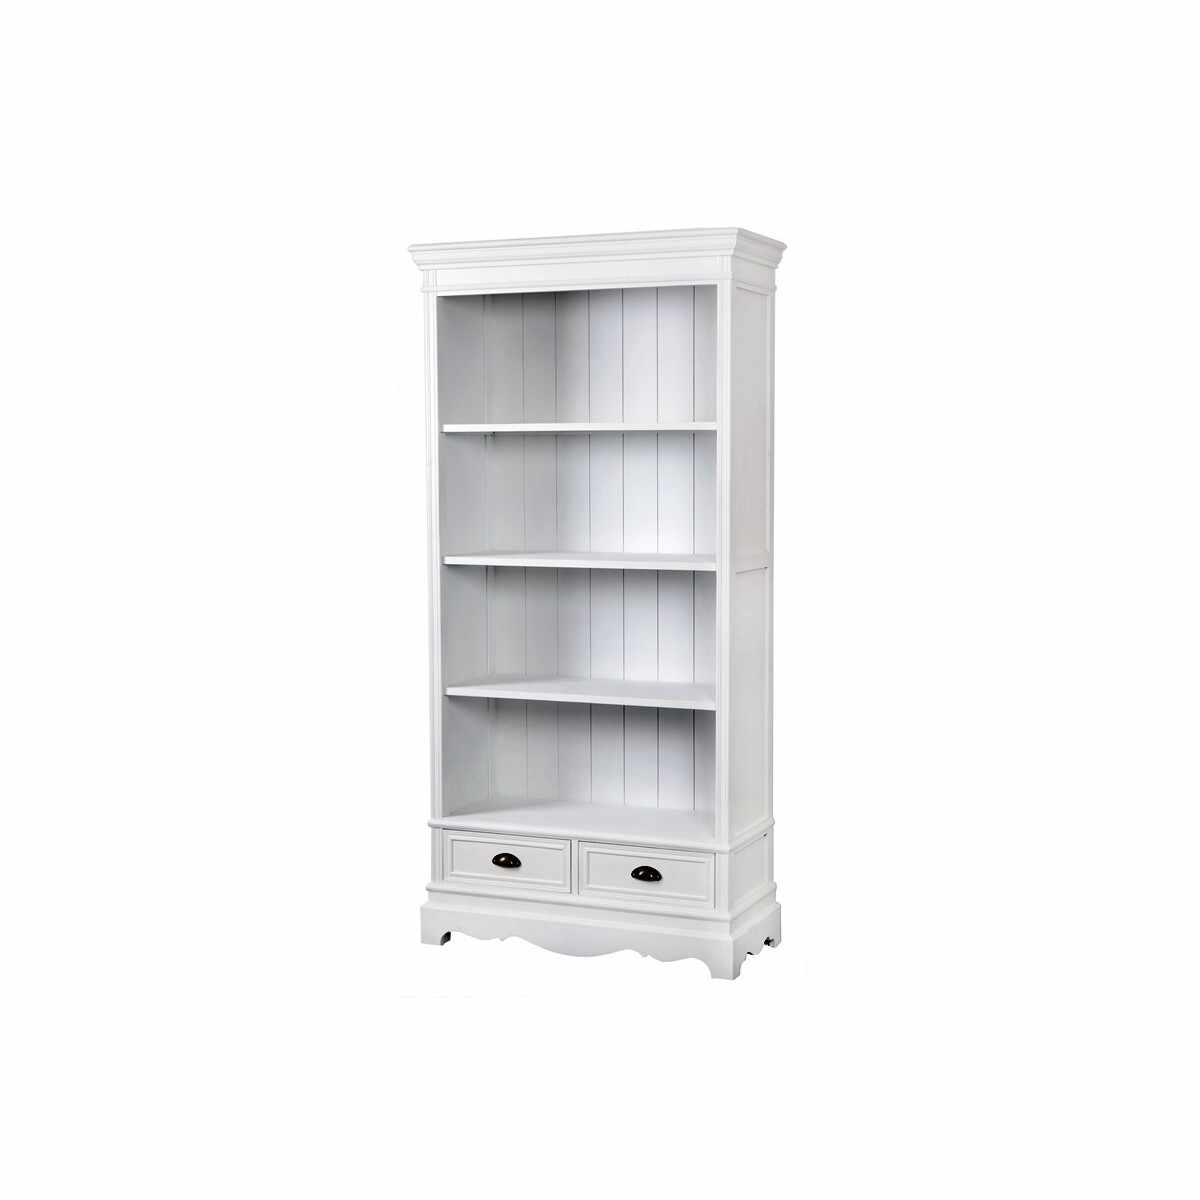 Biblioteca din lemn de plop si MDF, cu 2 sertare Latina LA02 White, l90xA39xH185 cm la pret 3027 lei